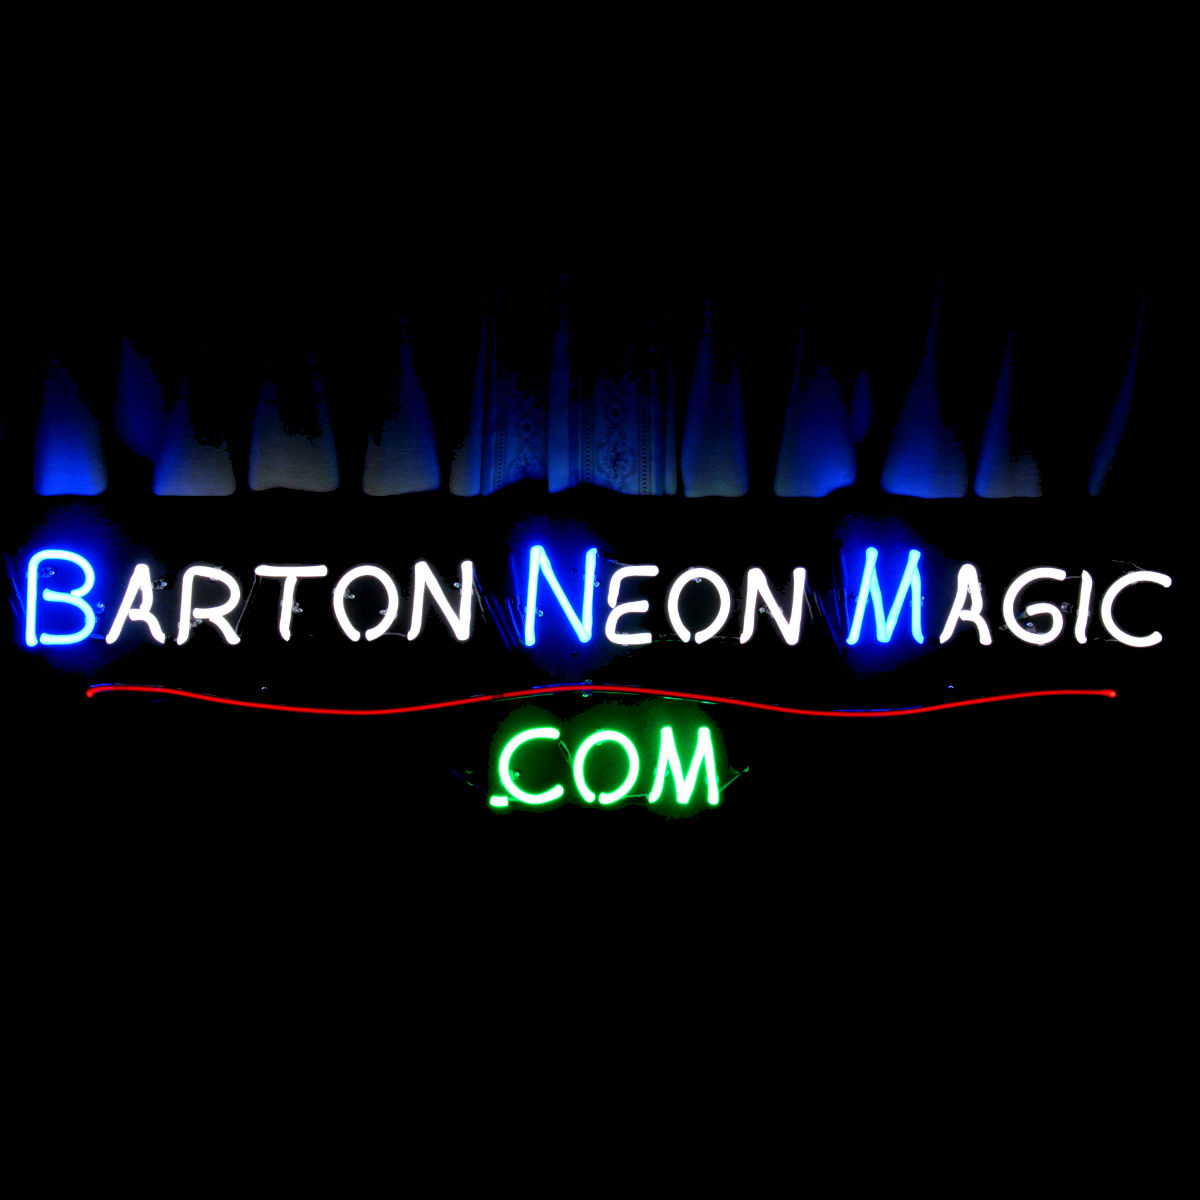 BartonNeonMagic.com - Brilliant Custom Neon by John Barton - Internationally Famous USA Neon Light Sculptor